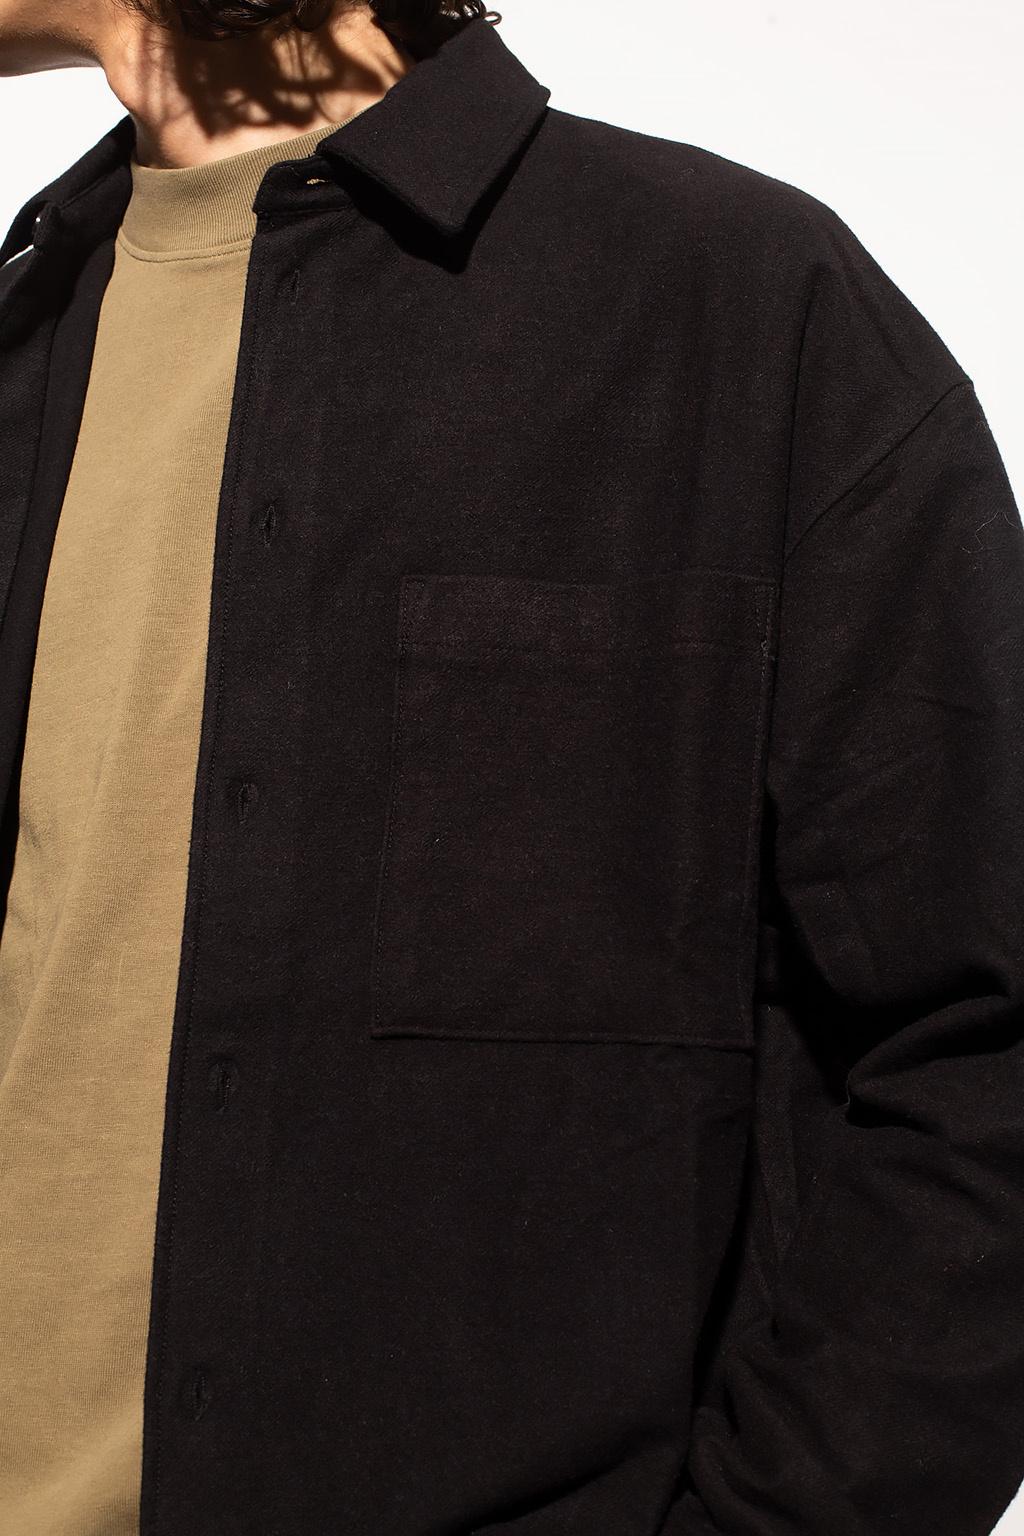 Samsøe Samsøe Shirt with pockets